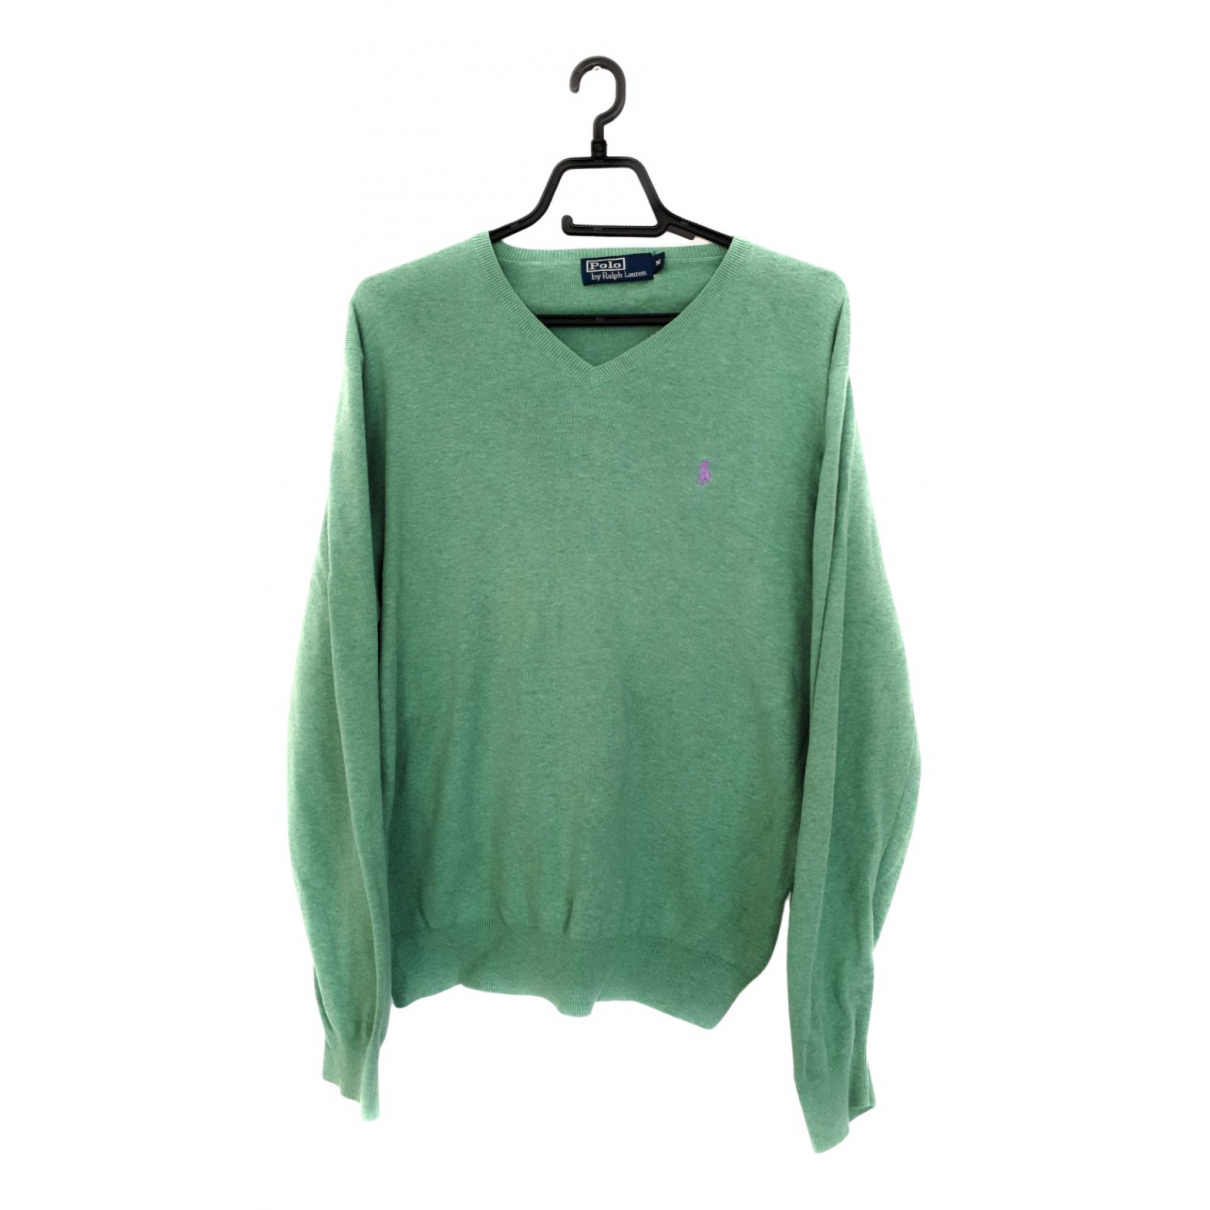 Polo Ralph Lauren \N Green Cotton Knitwear & Sweatshirts for Men M International